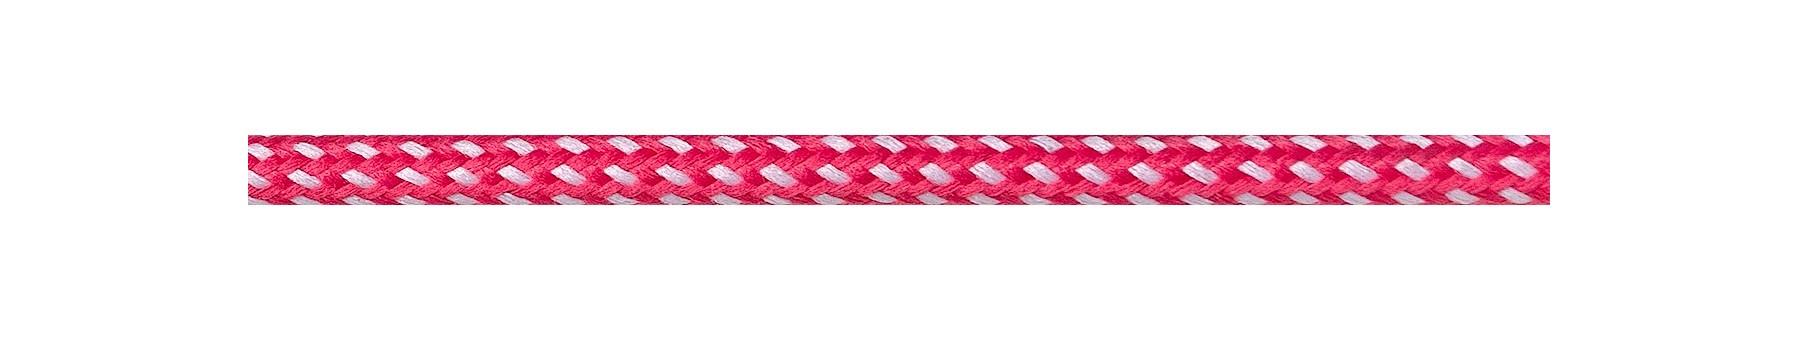 Textile Cable Pink-White Spots